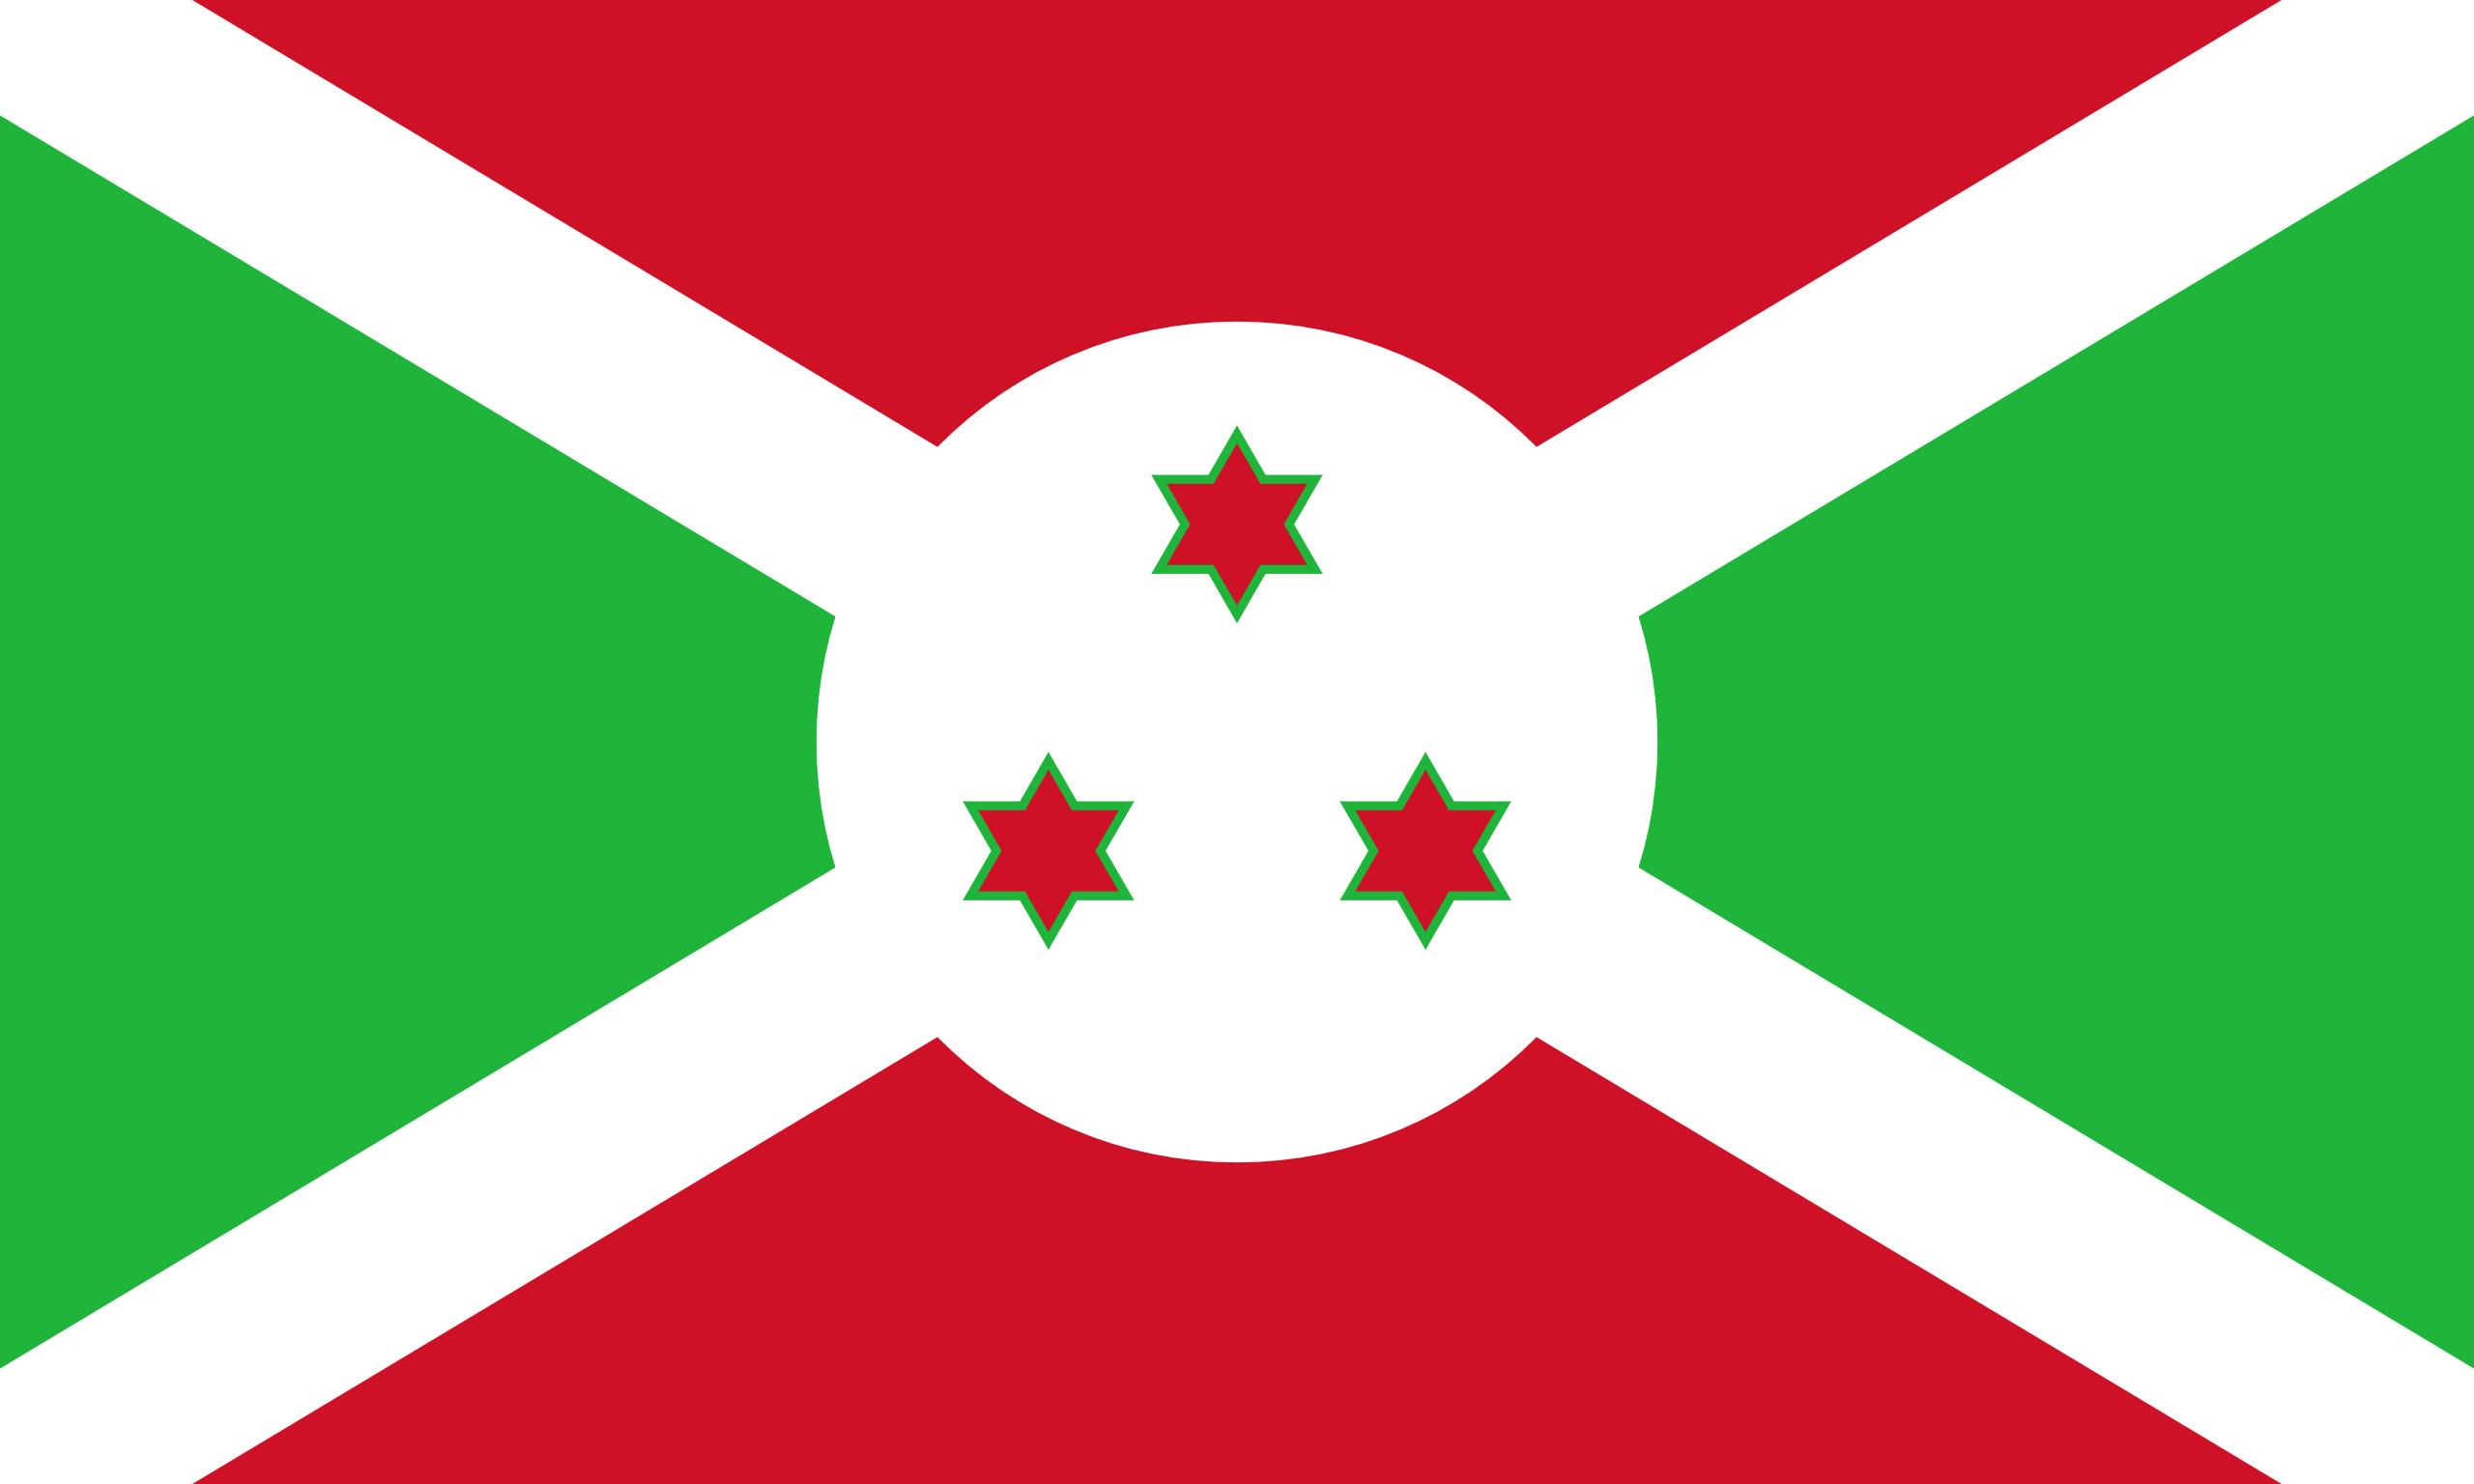 burundi, χώρα, έμβλημα, λογότυπο, σύμβολο - Wallpapers HD - Professor-falken.com